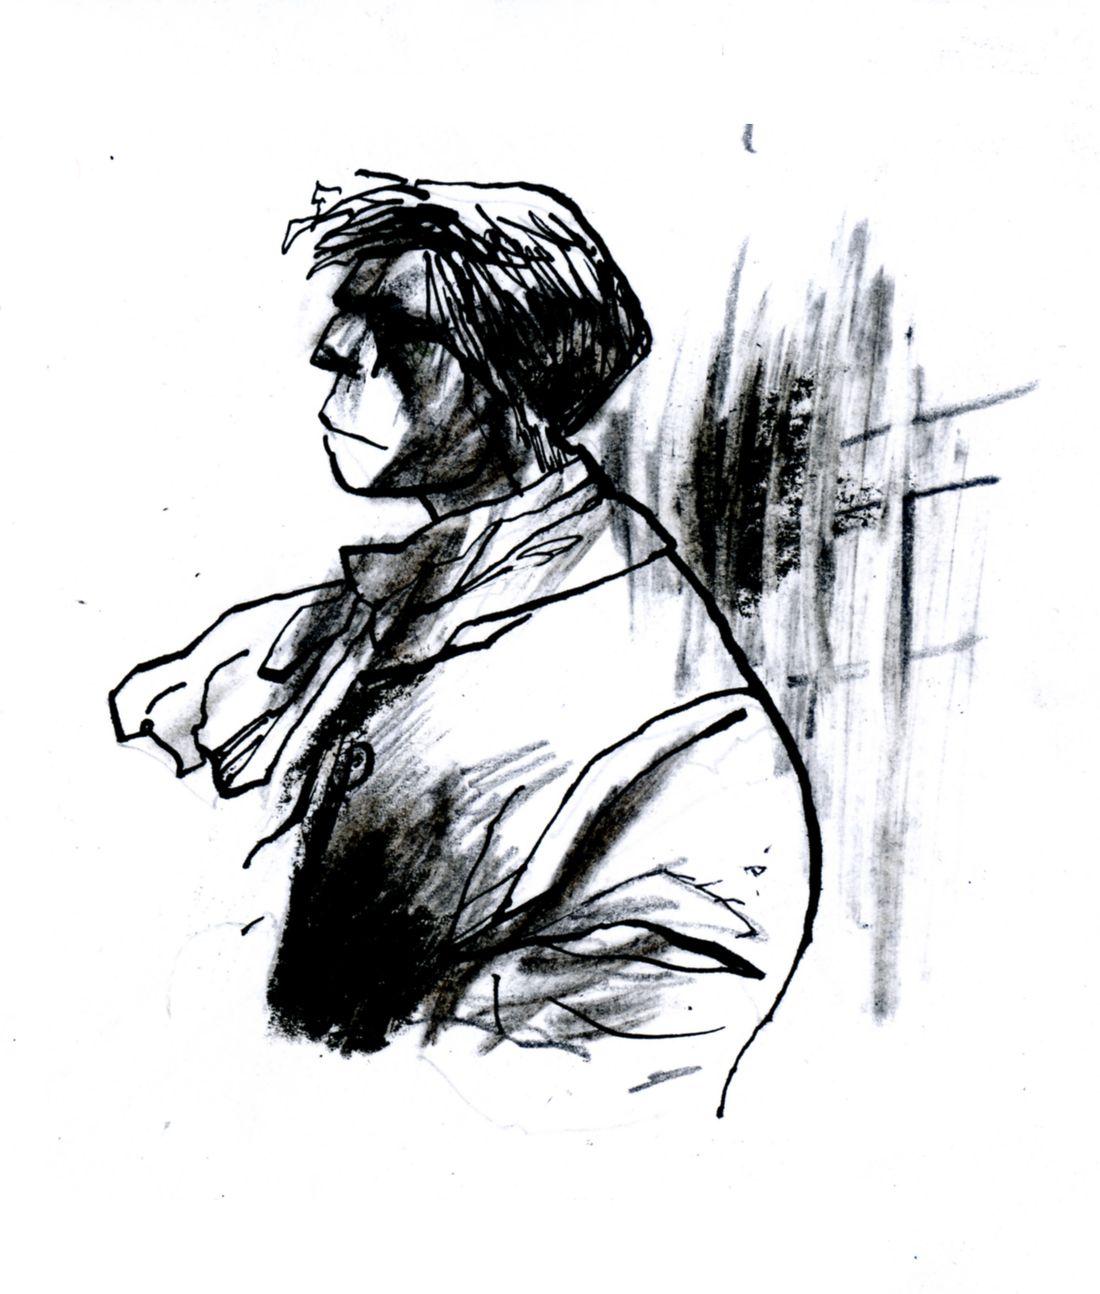 Peter Dillon, l'énigme Laperouse, recherche Peter Dillon © Boris Beuzelin